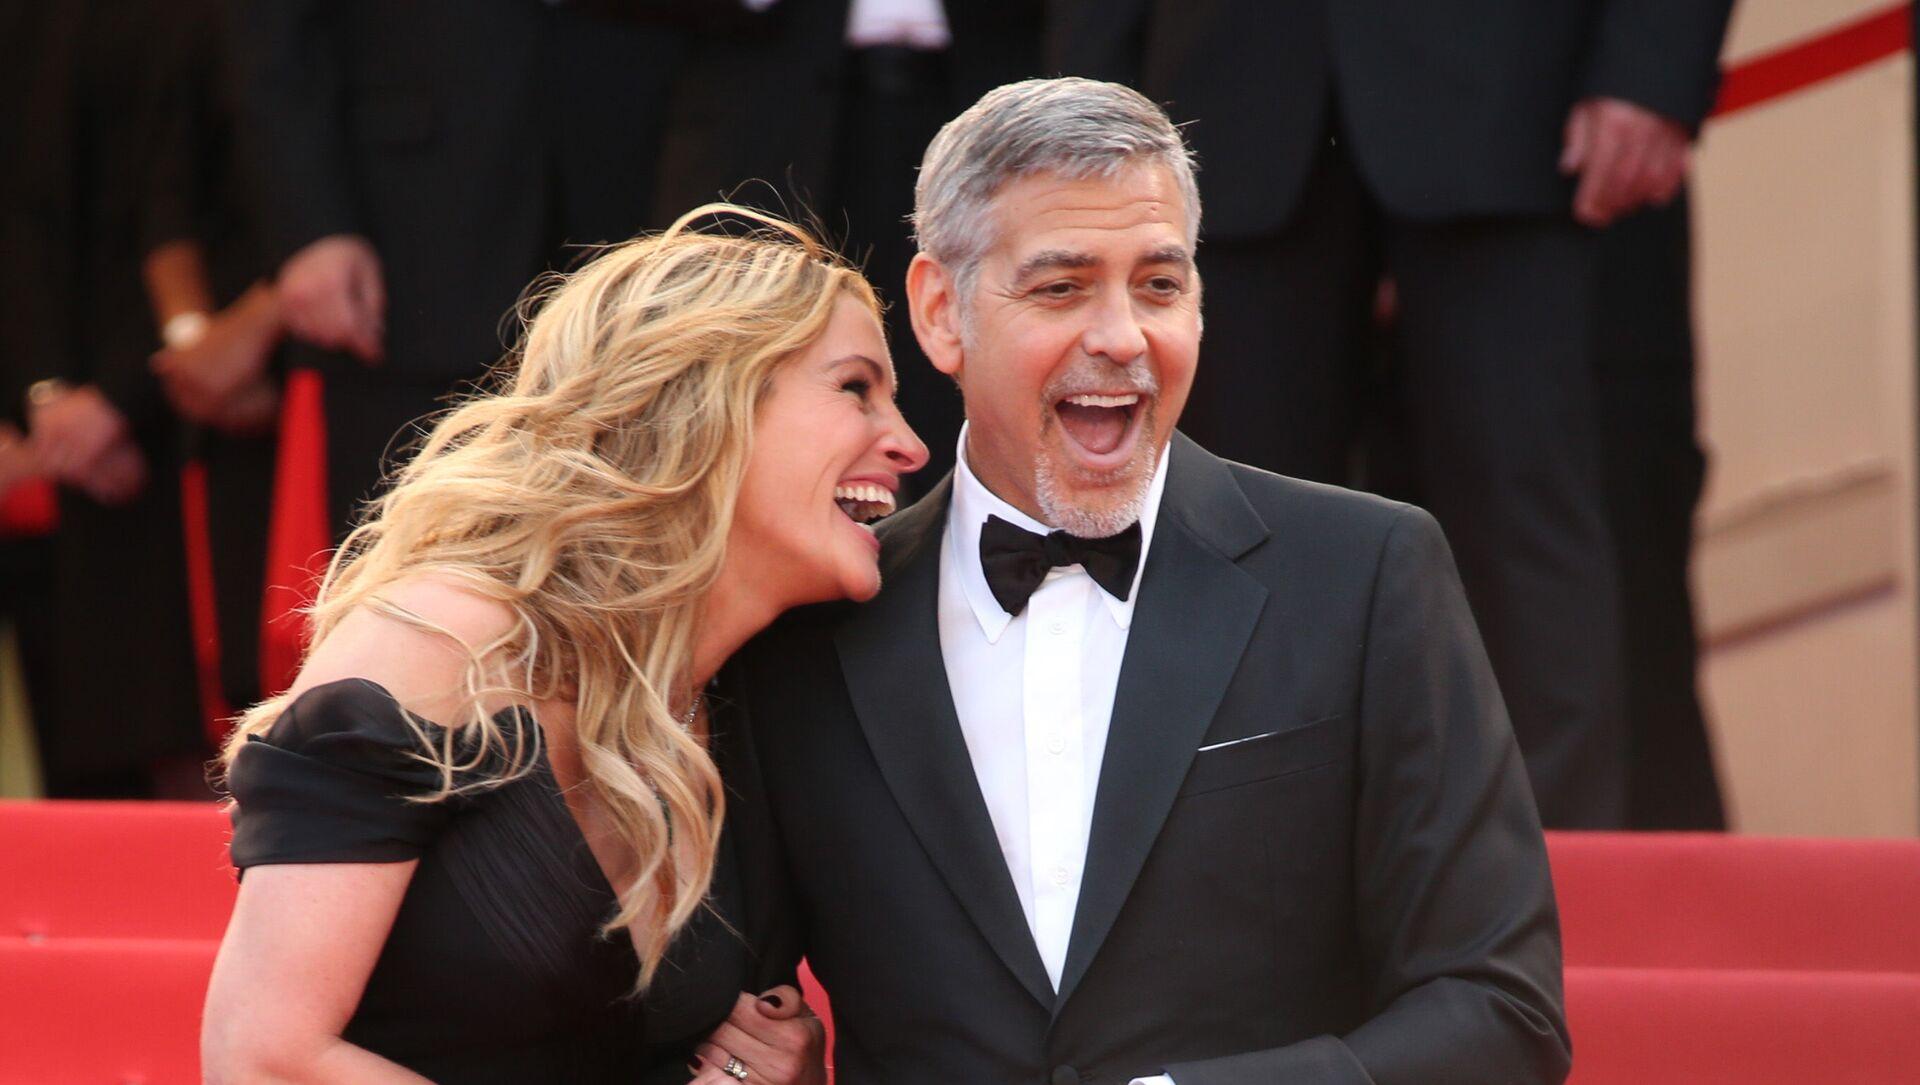 Hollywoodzcy aktorzy George Clooney i Julia Roberts - Sputnik Polska, 1920, 02.03.2021